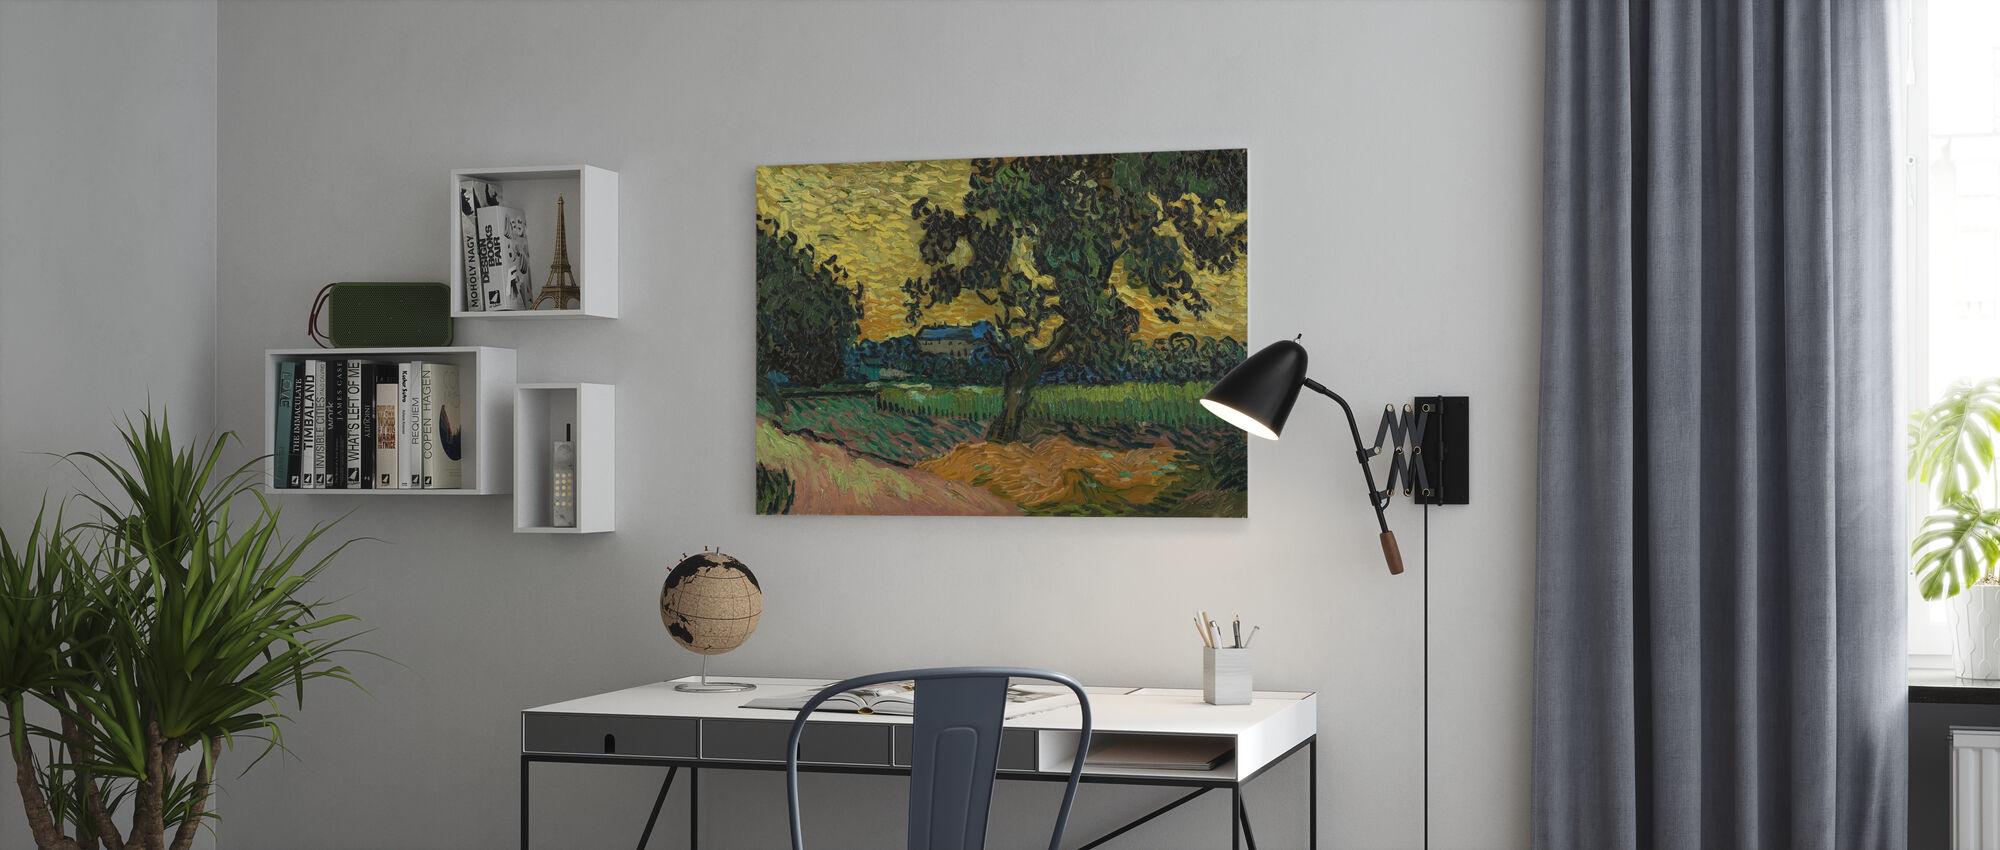 Landskap vid Twilight - Vincent Van Gogh - Canvastavla - Kontor